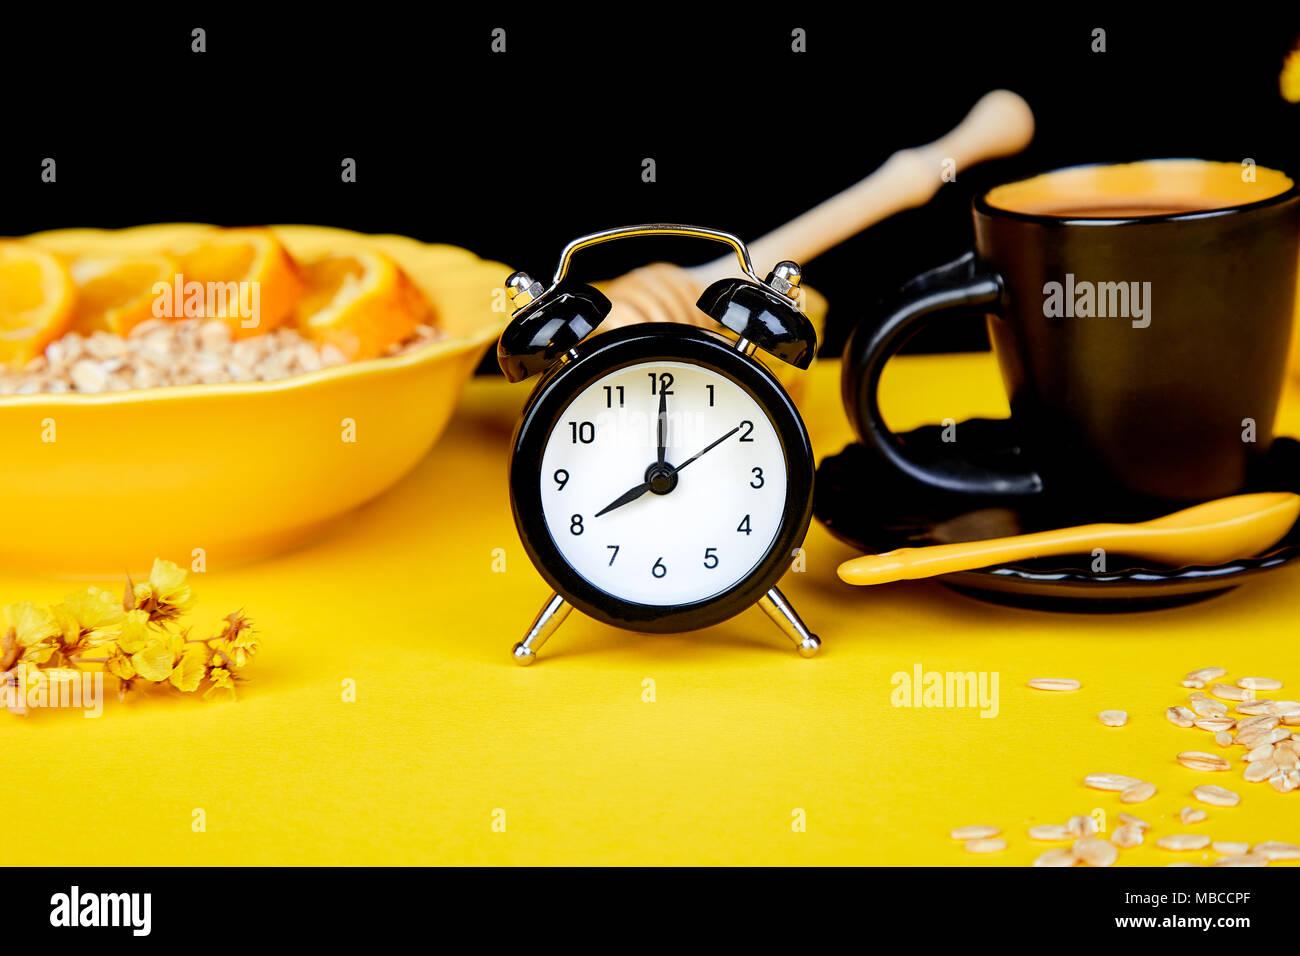 morning coffee granola breakfast with fruit near black alarm clock